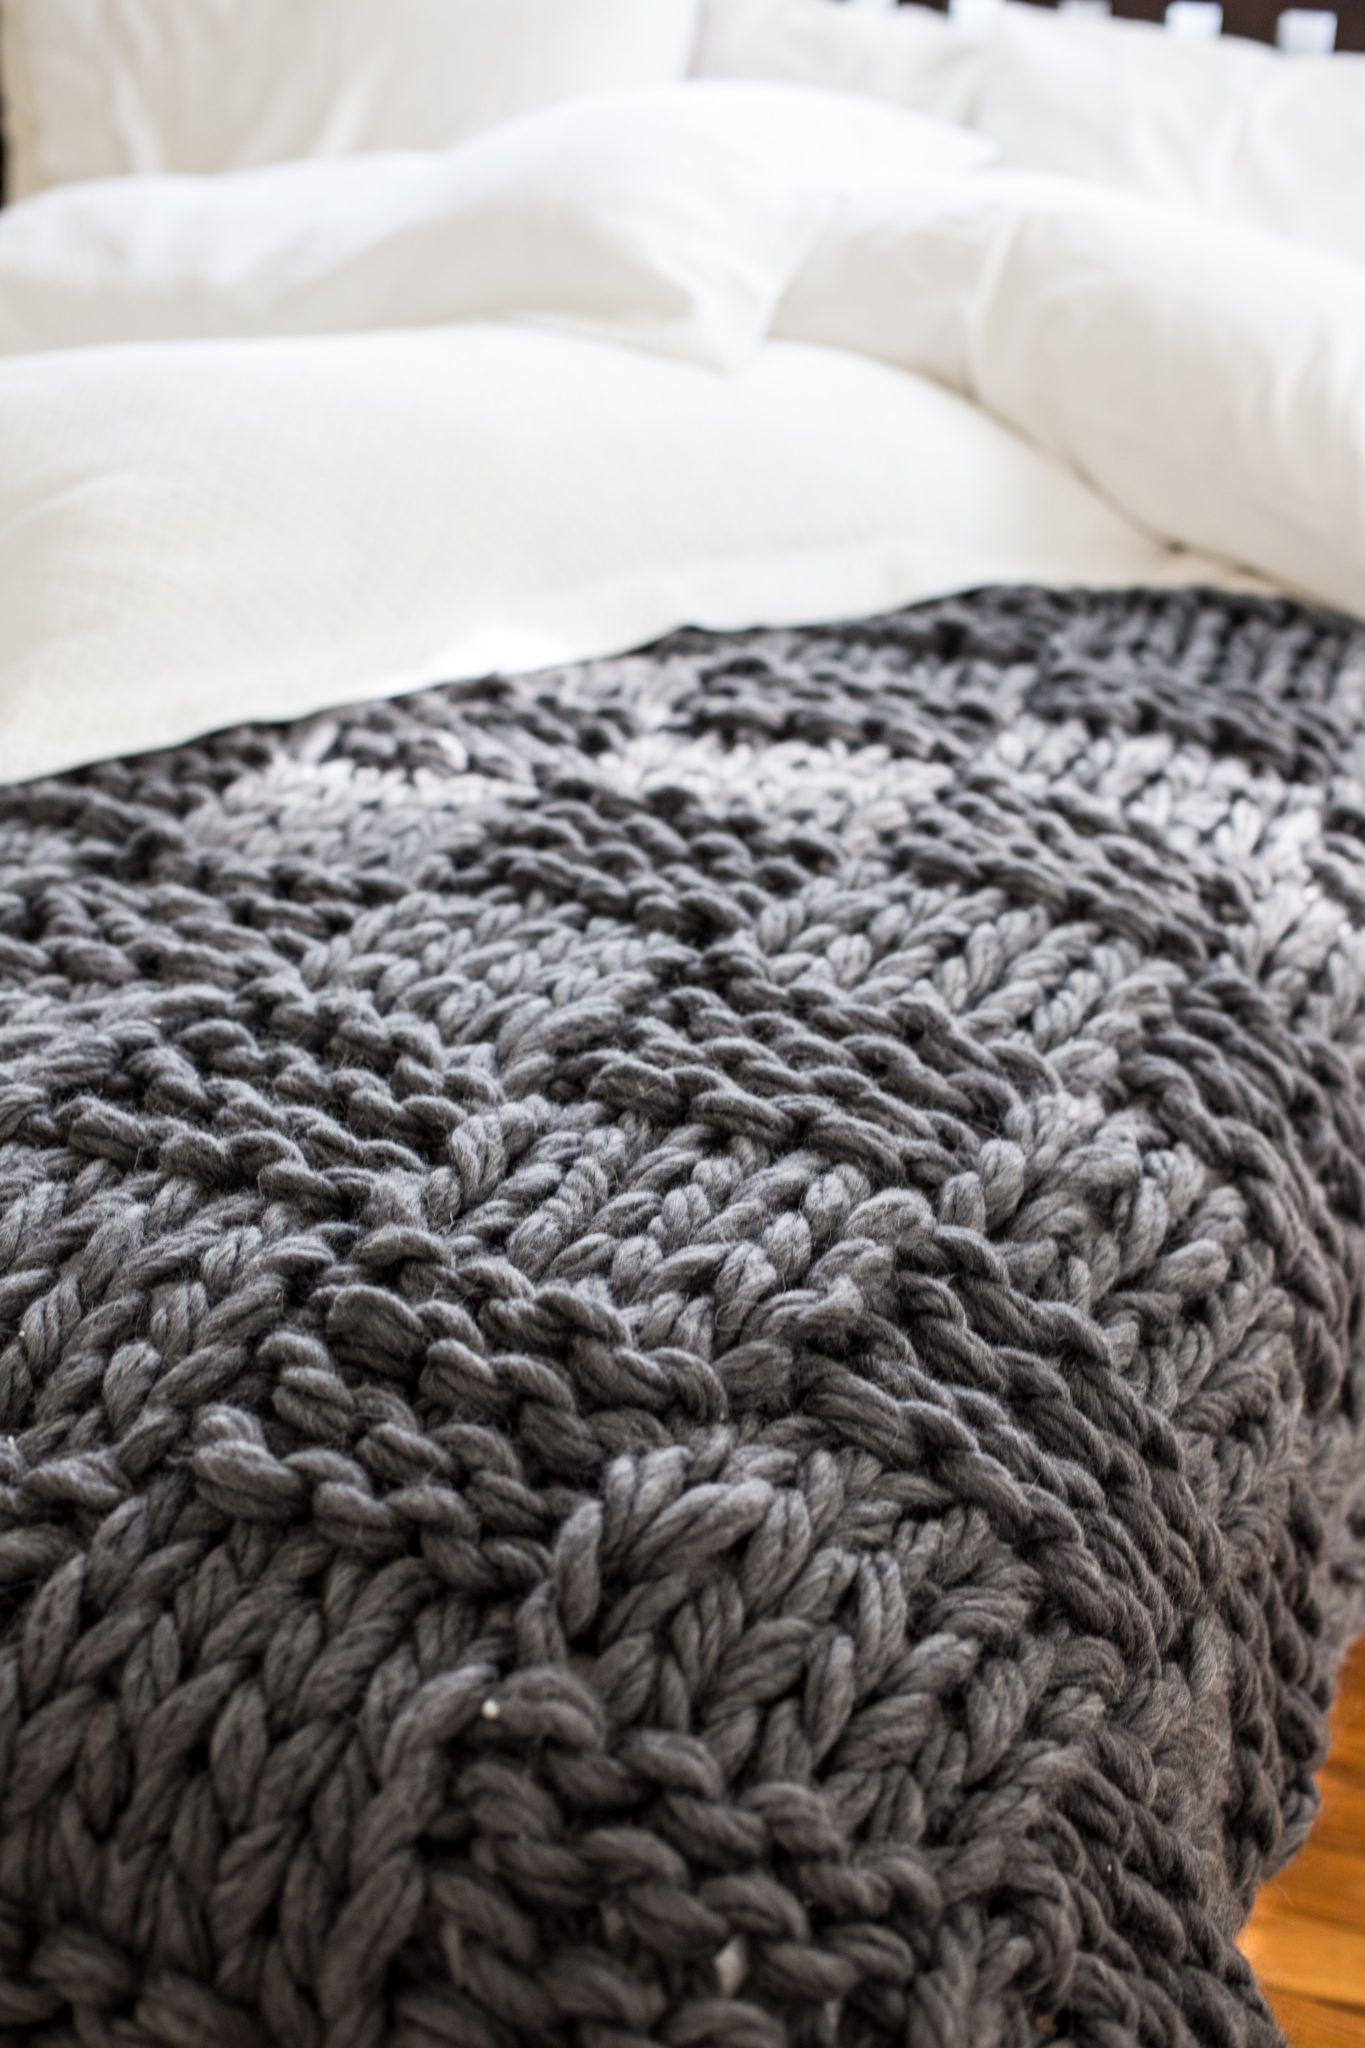 Chunky Arm Knit Blanket Pattern | Knitting blanket patterns, Arm ...